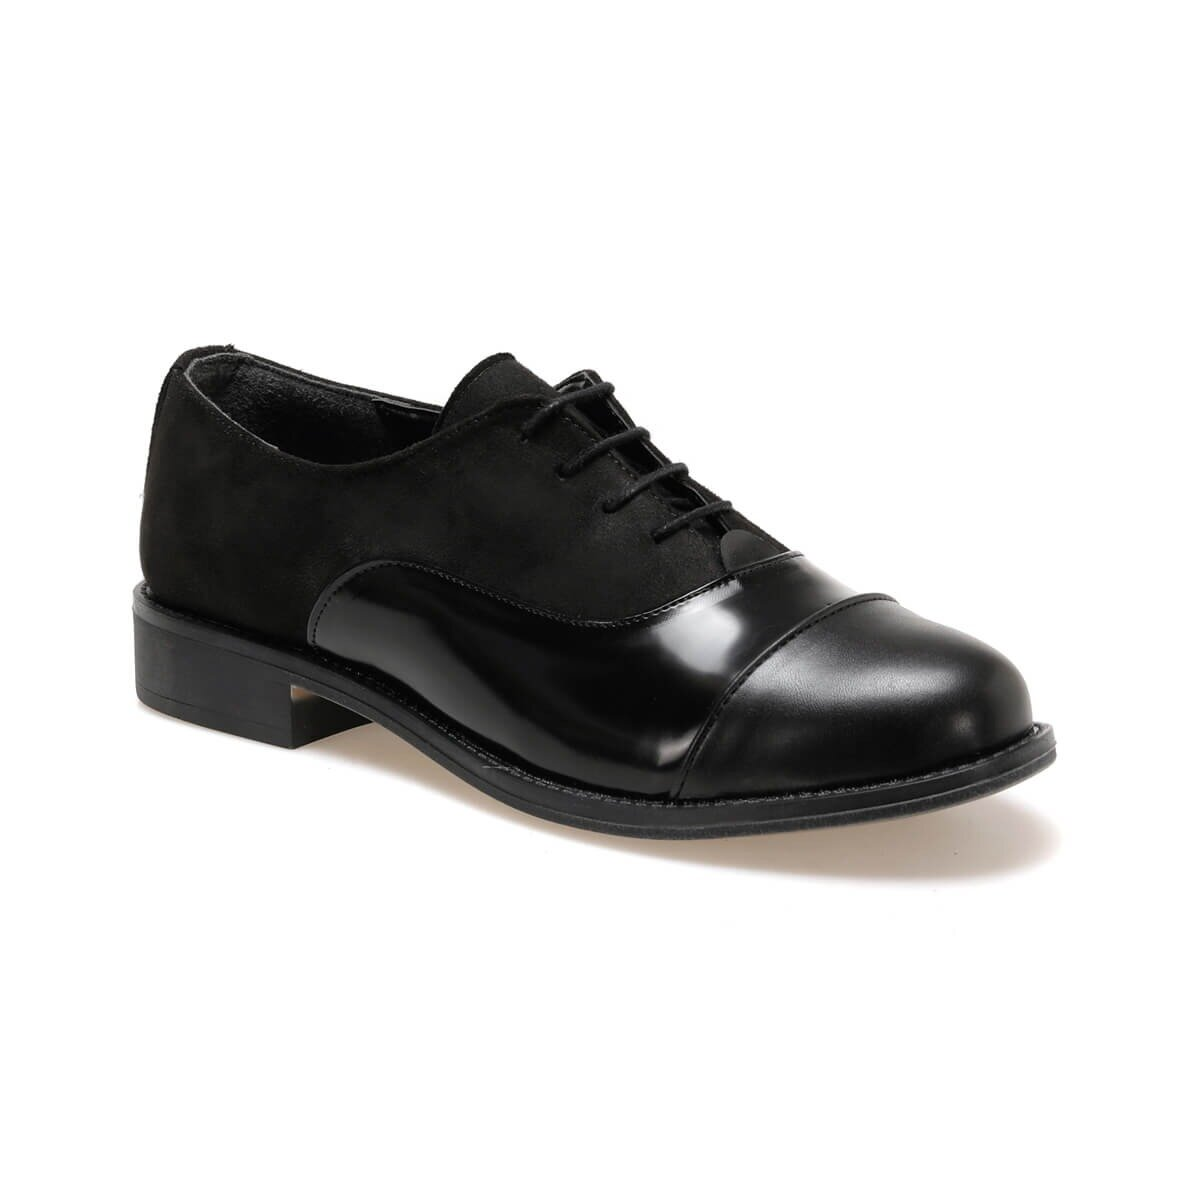 FLO DW19034 Black Women Oxford Shoes Miss F